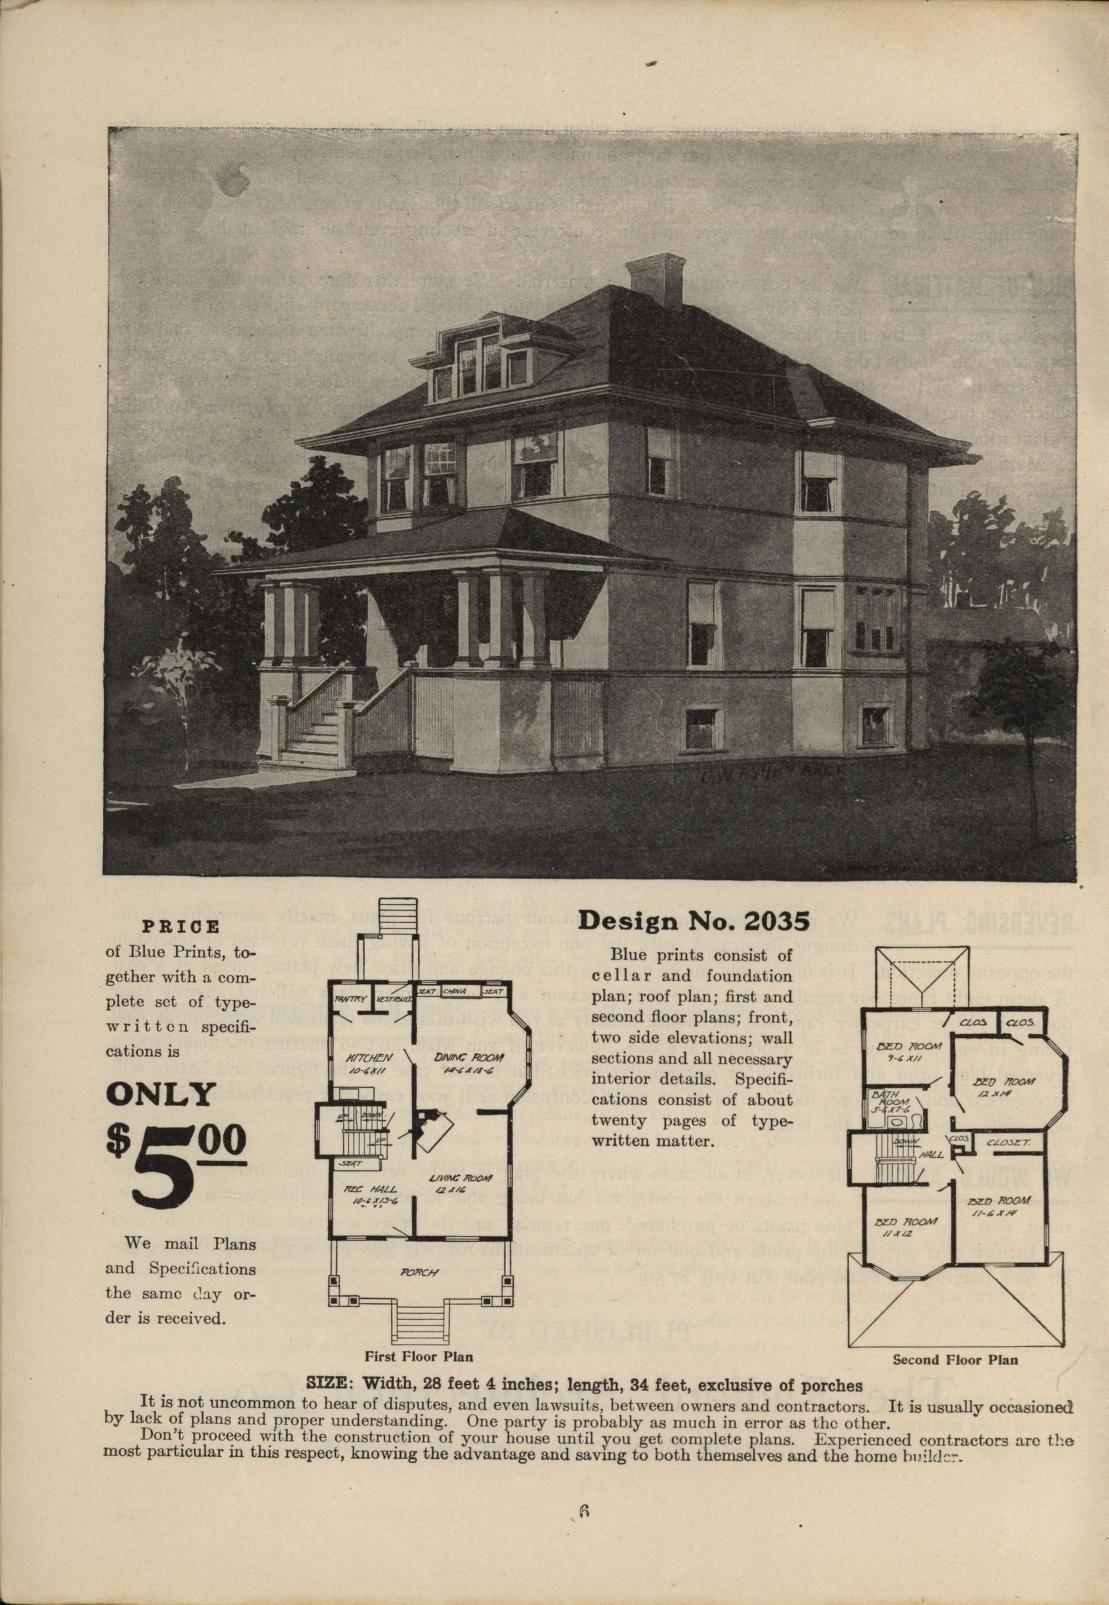 radford home builder volume ii - 1940s Beach House Plans